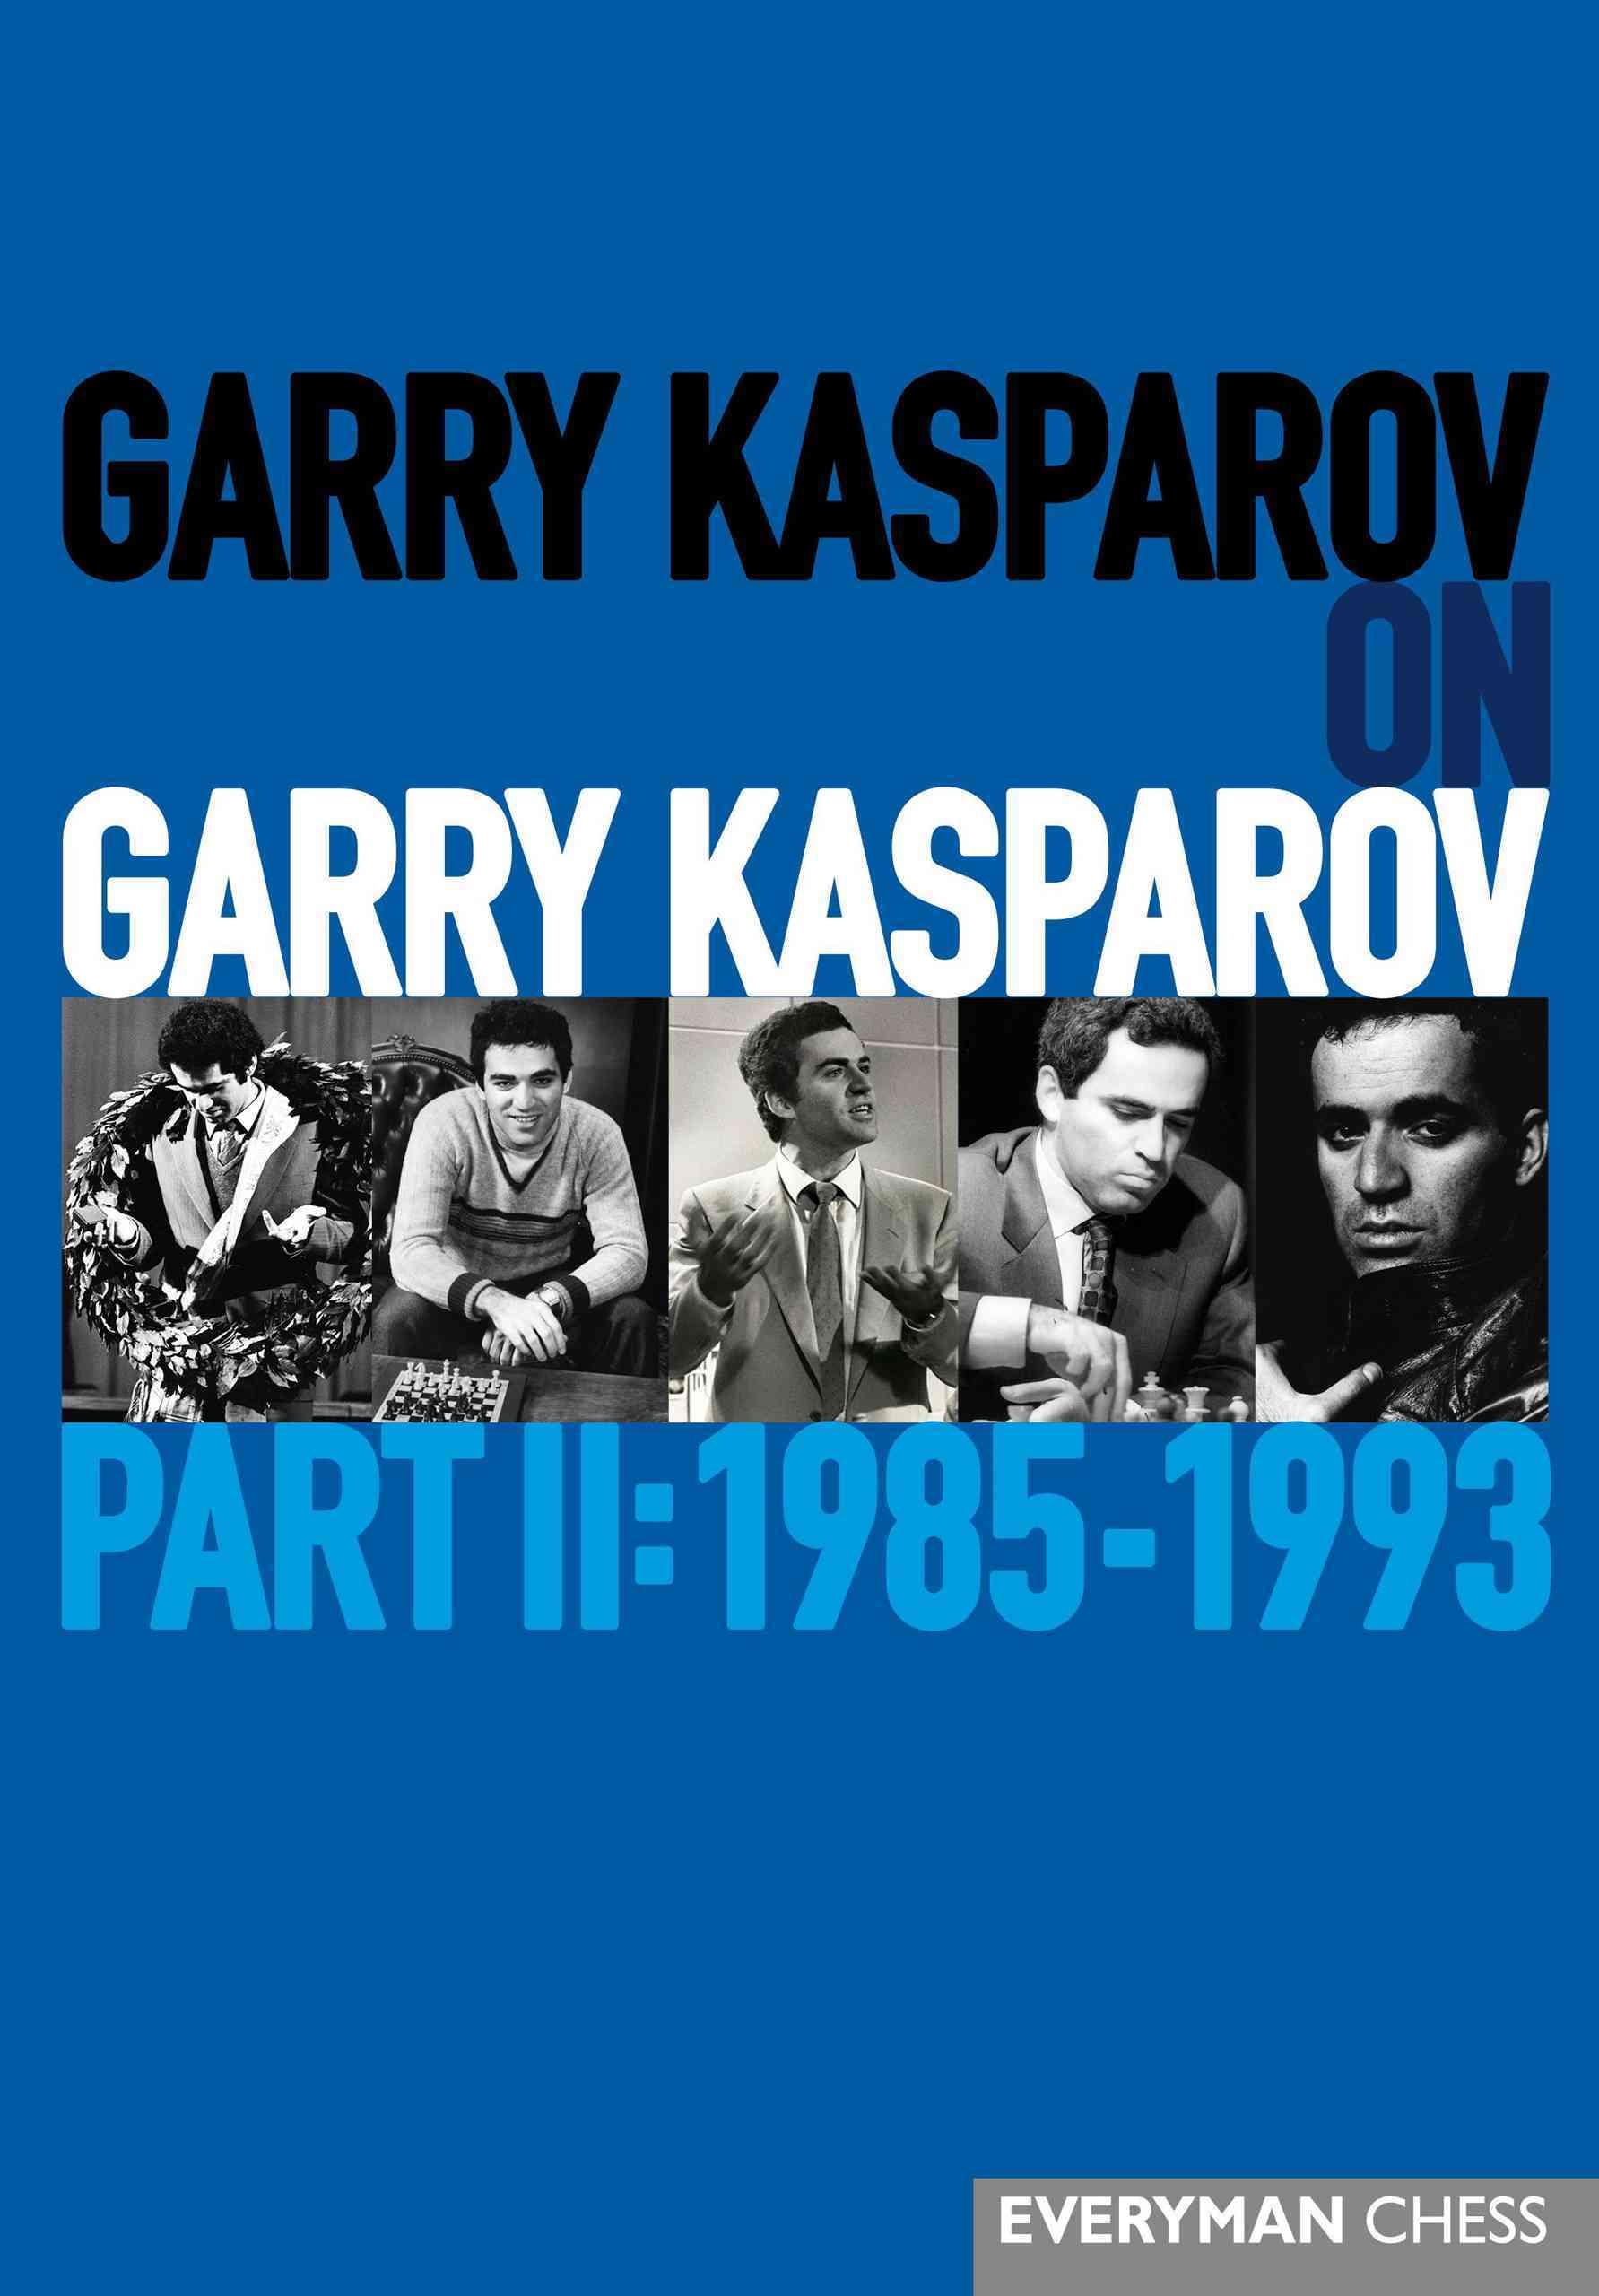 Garry Kasparov on Garry Kasparov: 1985-1993 (Hardcover)